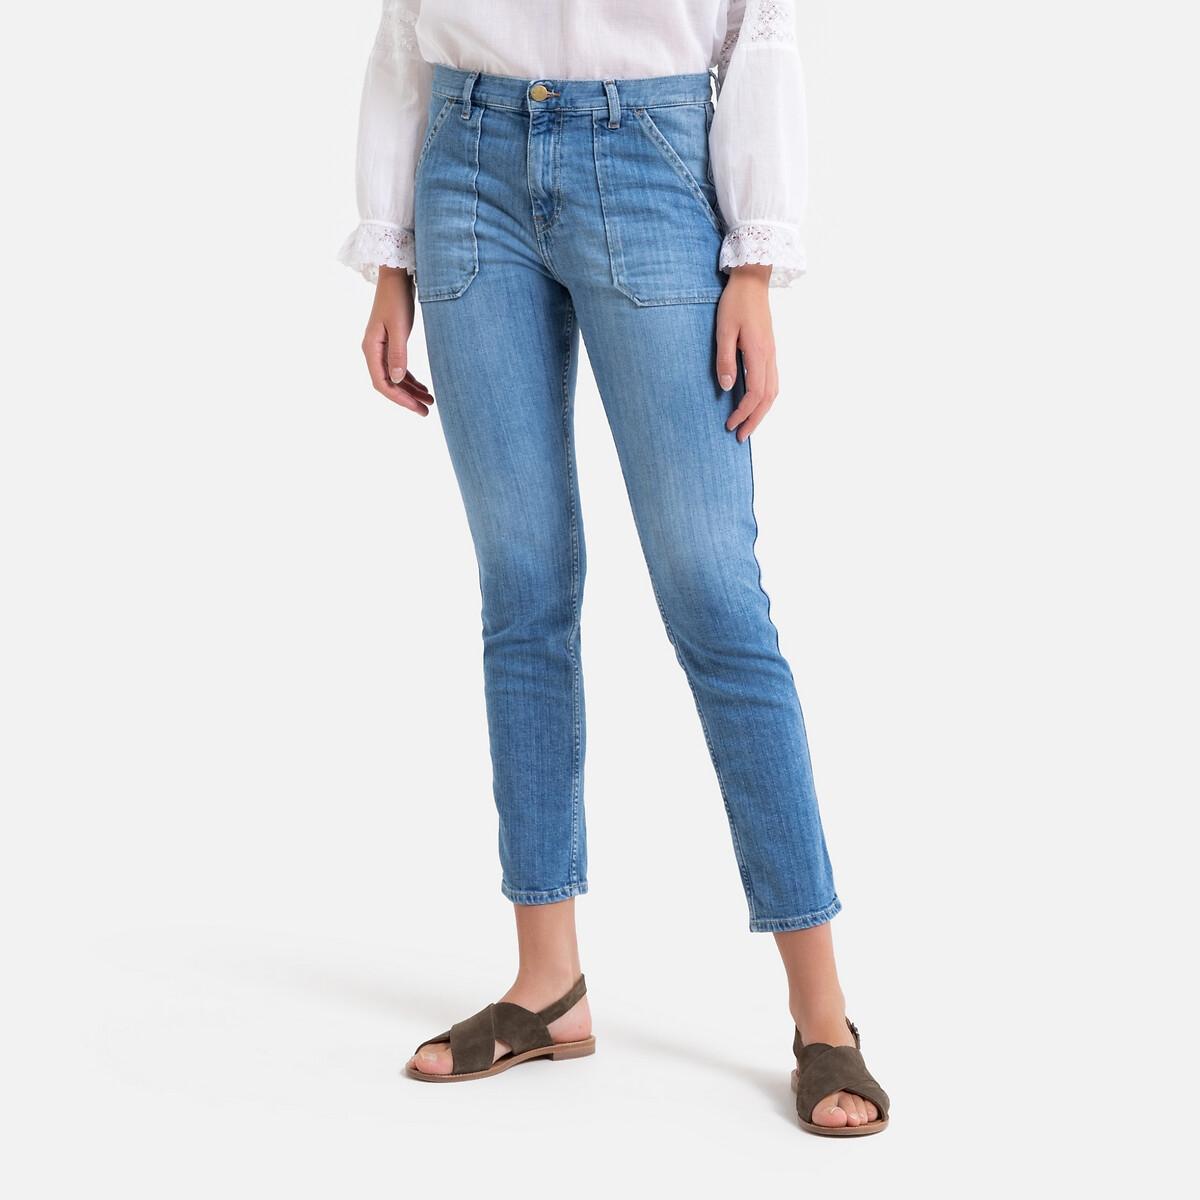 цена Джинсы La Redoute Слим SALLY 1(S) синий онлайн в 2017 году